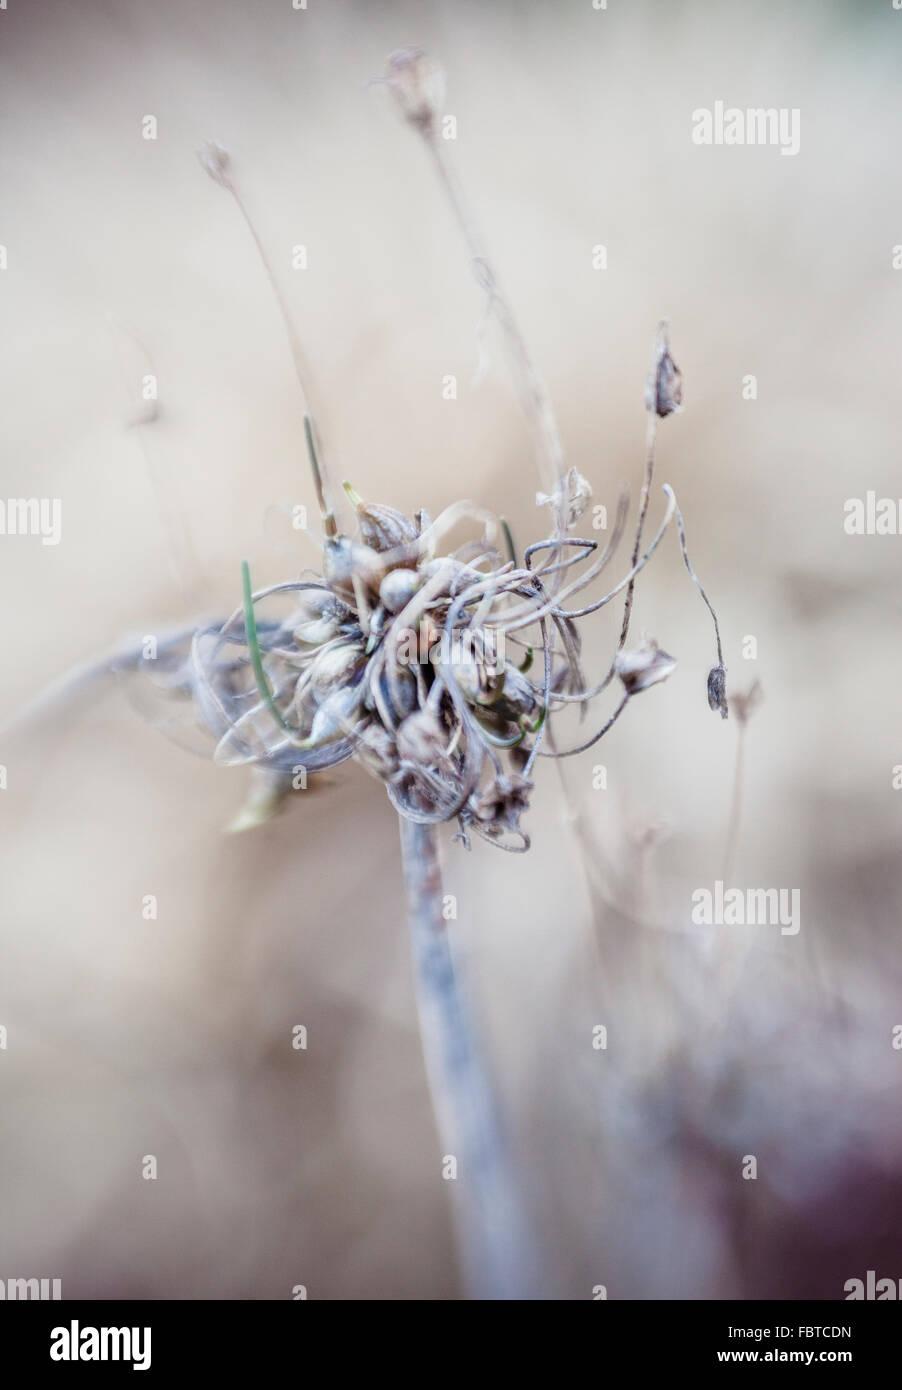 Seedhead of Allium vineale 'Hair' - Stock Image